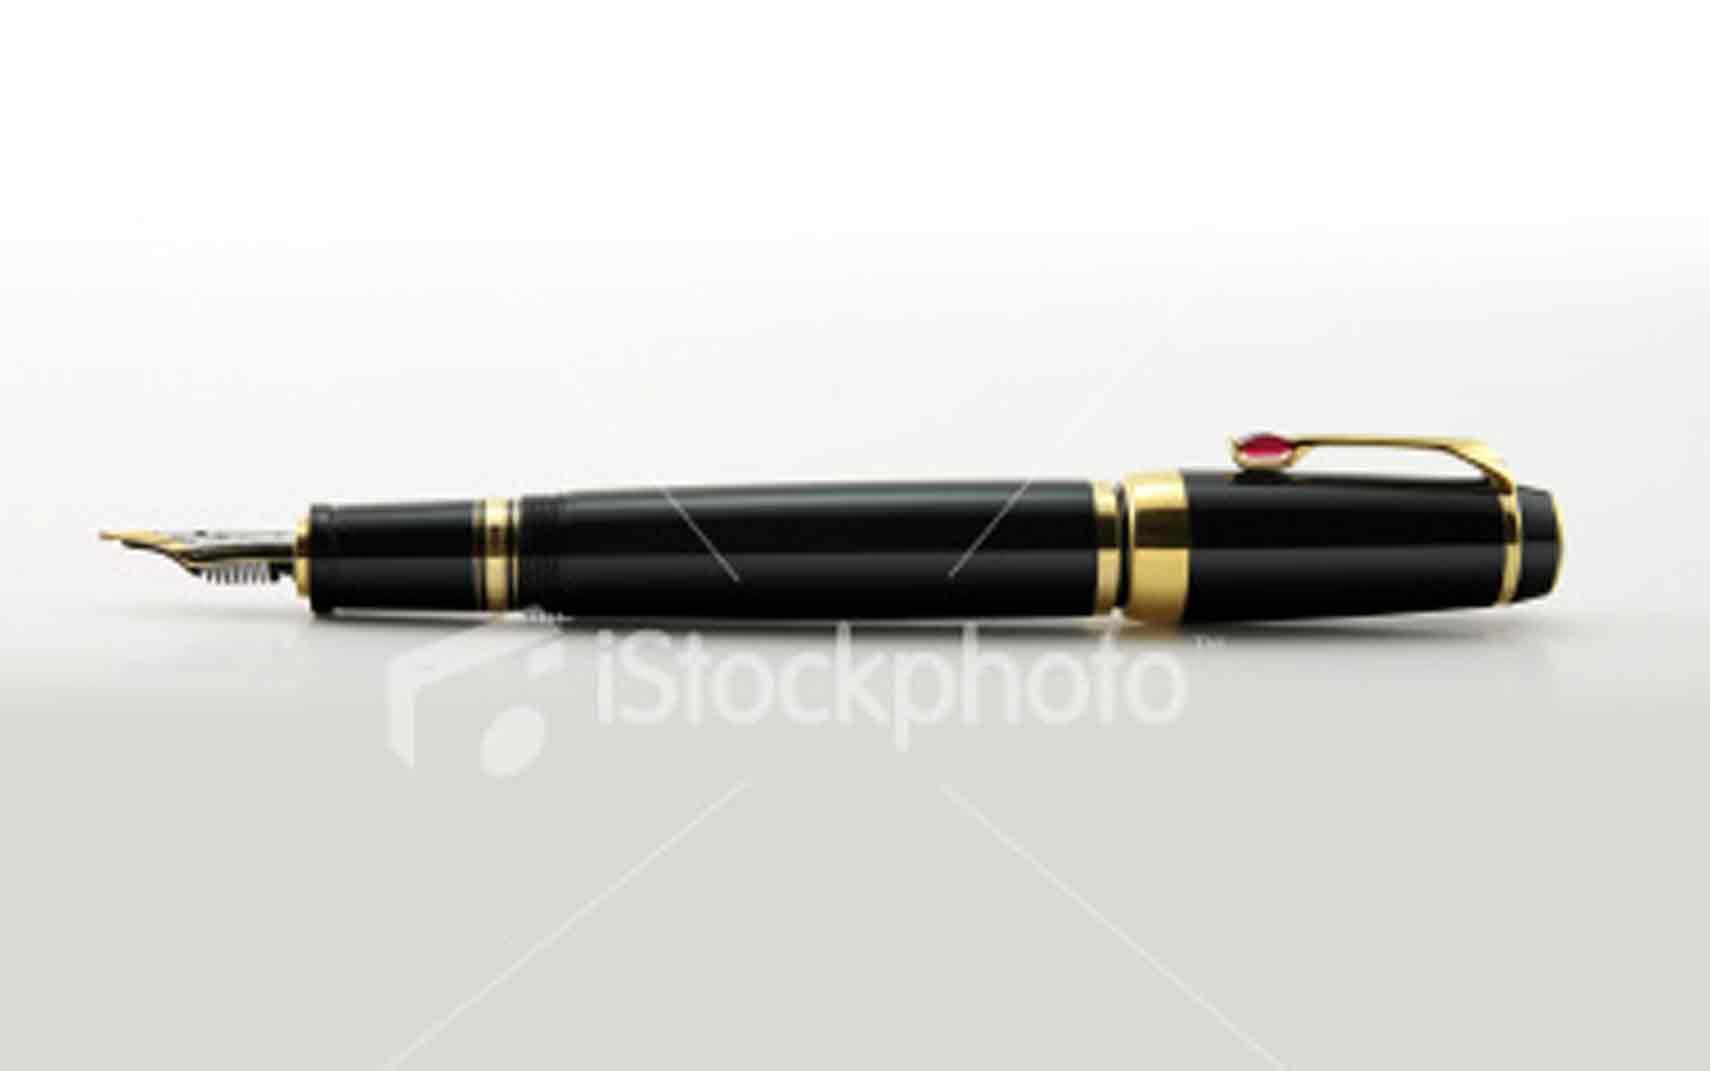 Levitra pen